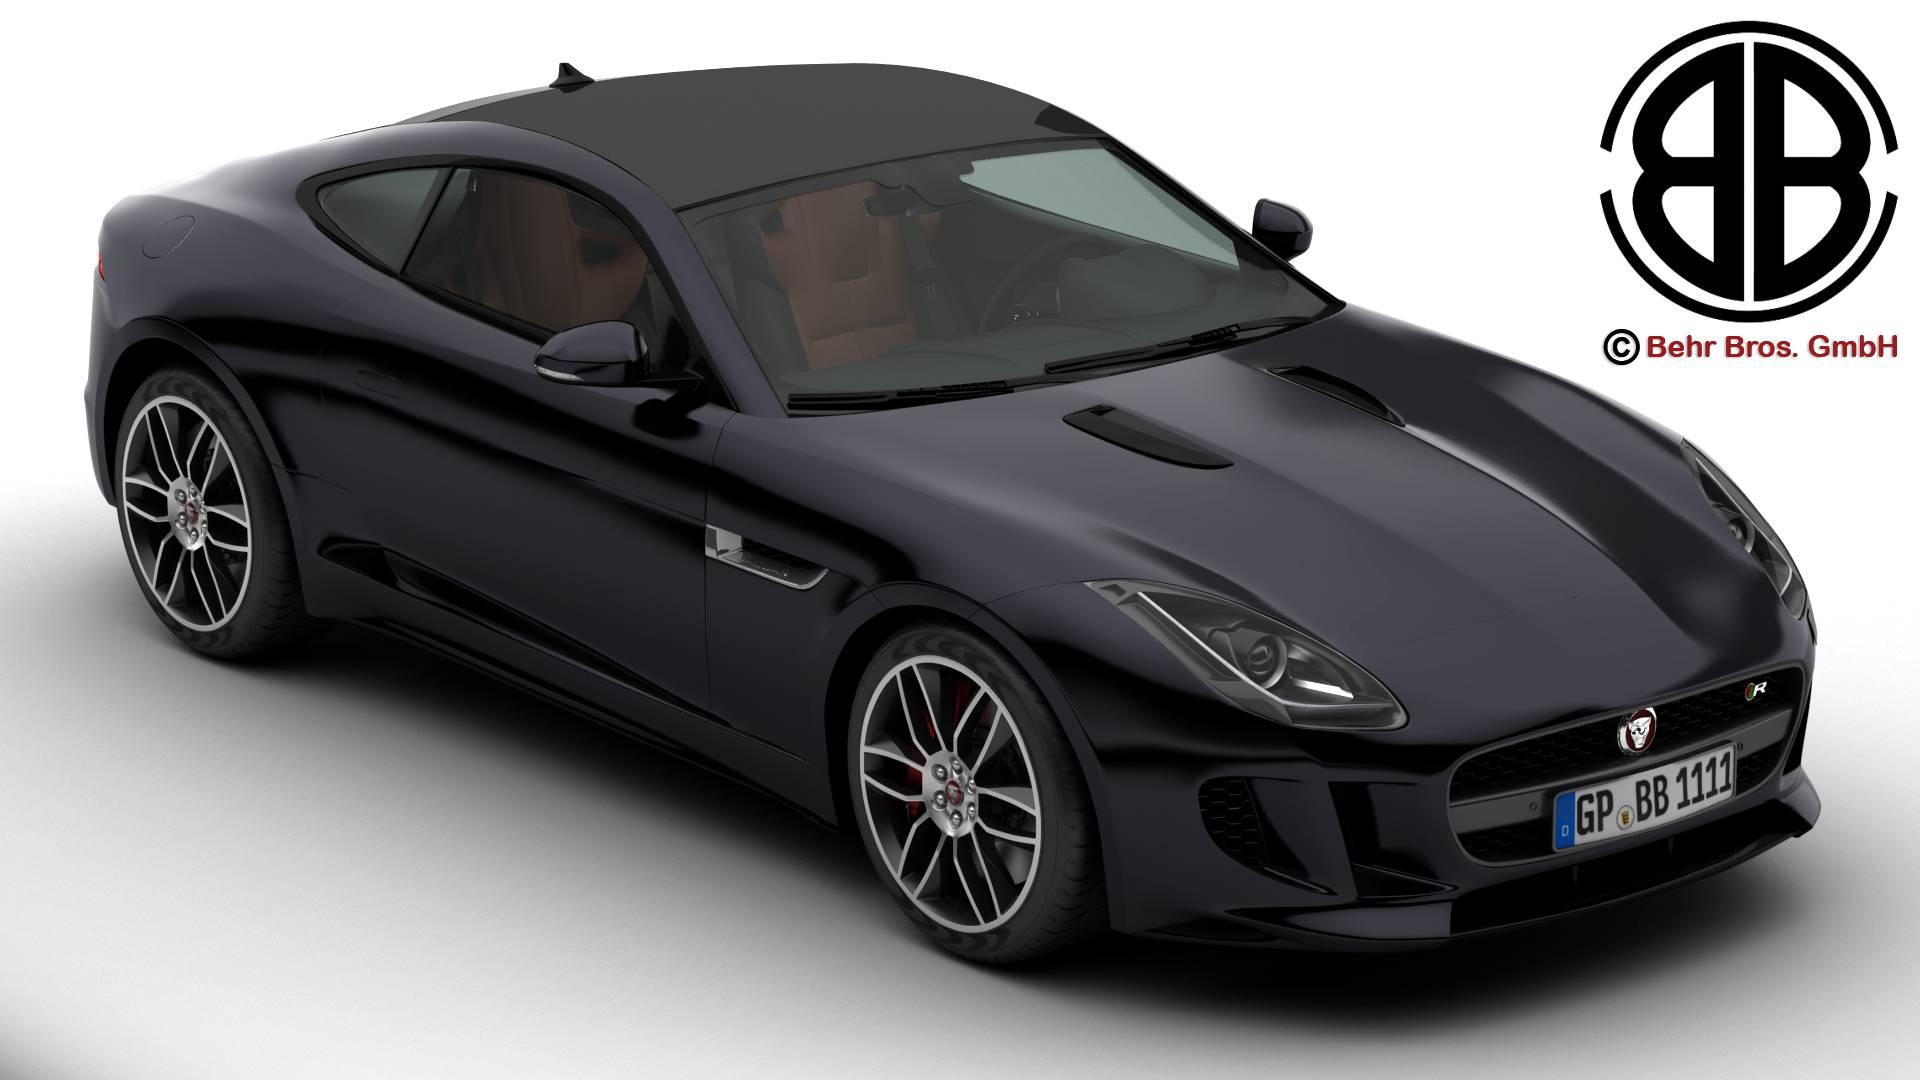 jaguar f tipi r coupe 2015 3d modeli 3ds max fbx c4d lwo ma mb obj 212066